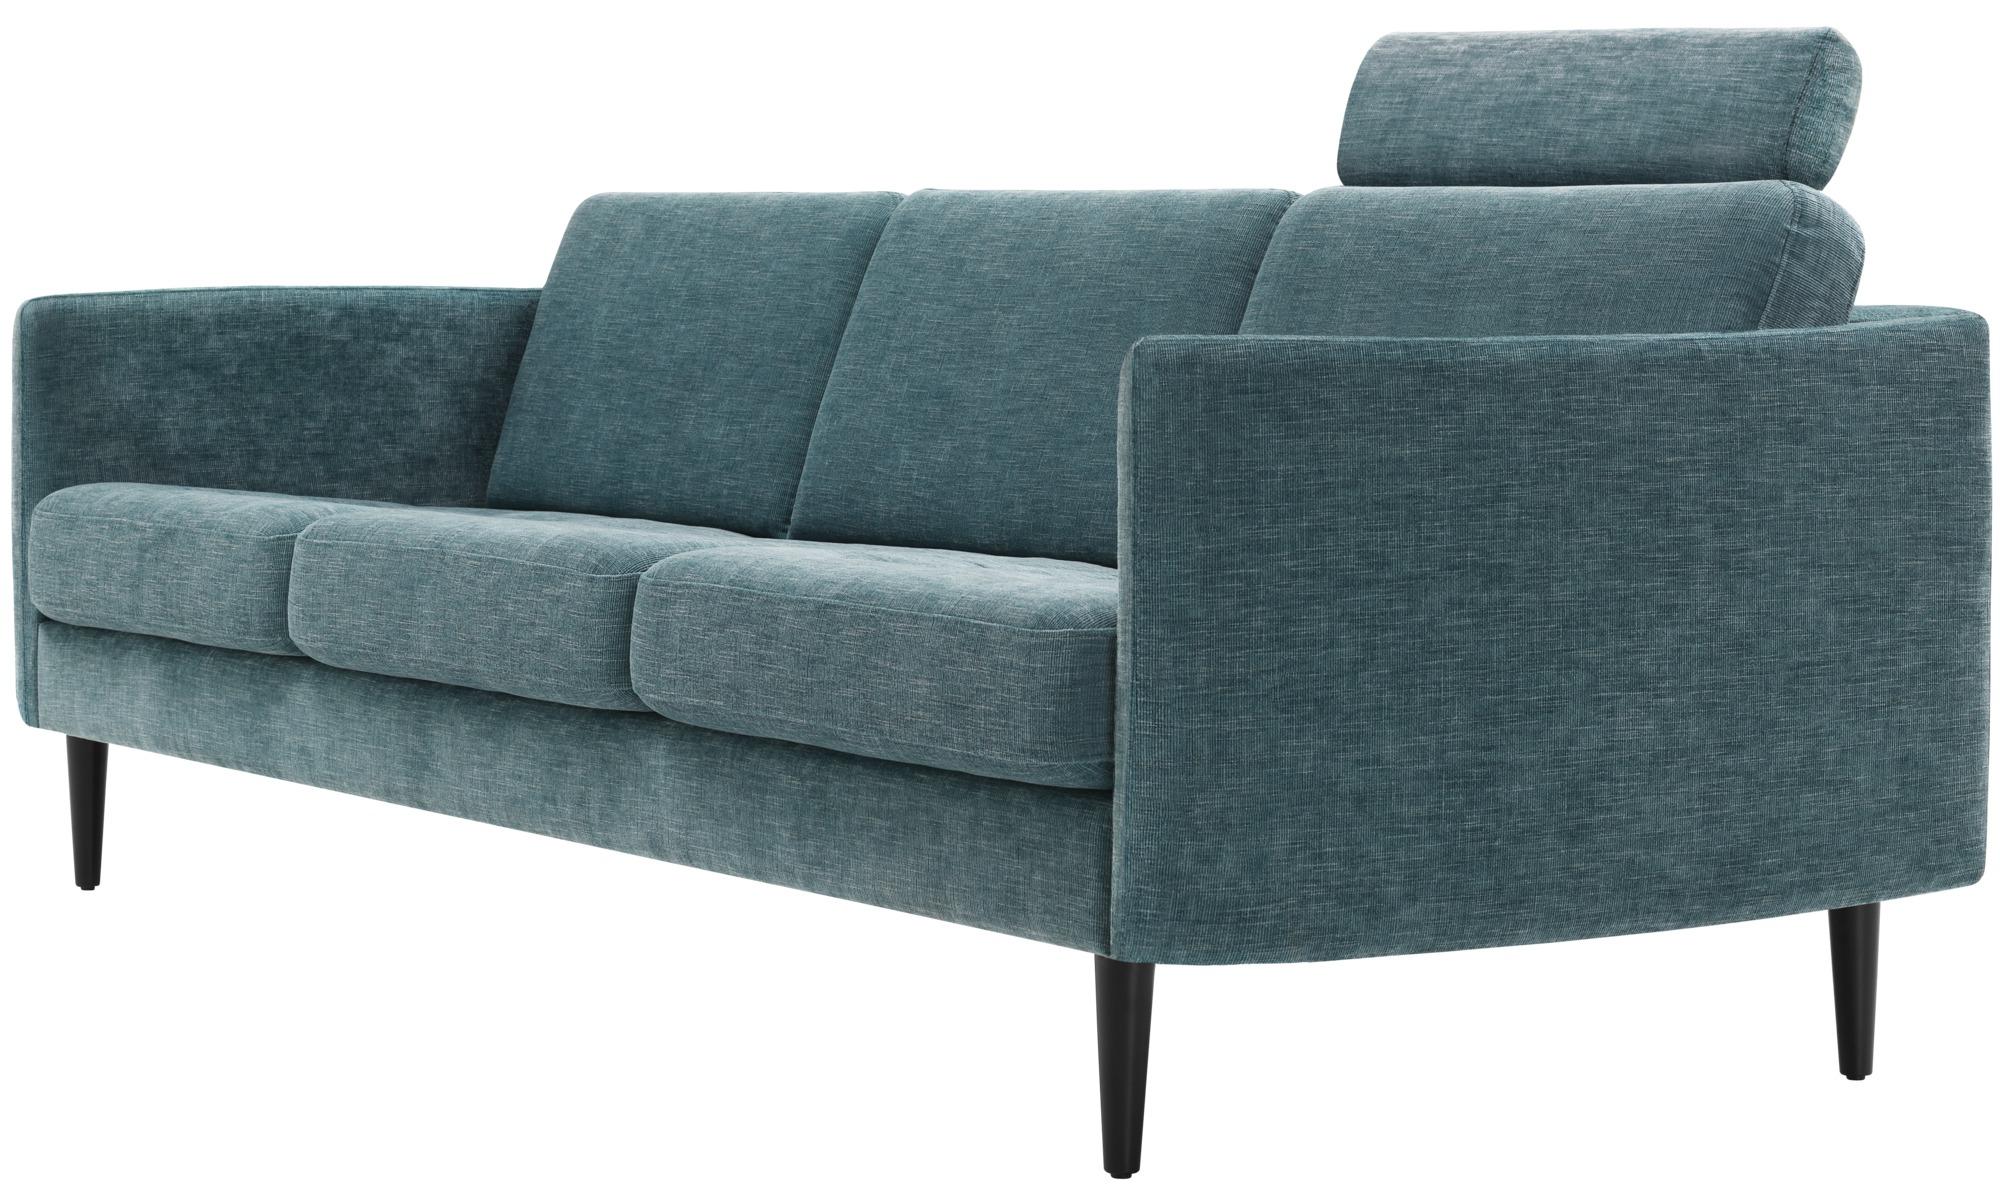 sofa osaka sofa getuftete sitzfl che boconcept. Black Bedroom Furniture Sets. Home Design Ideas